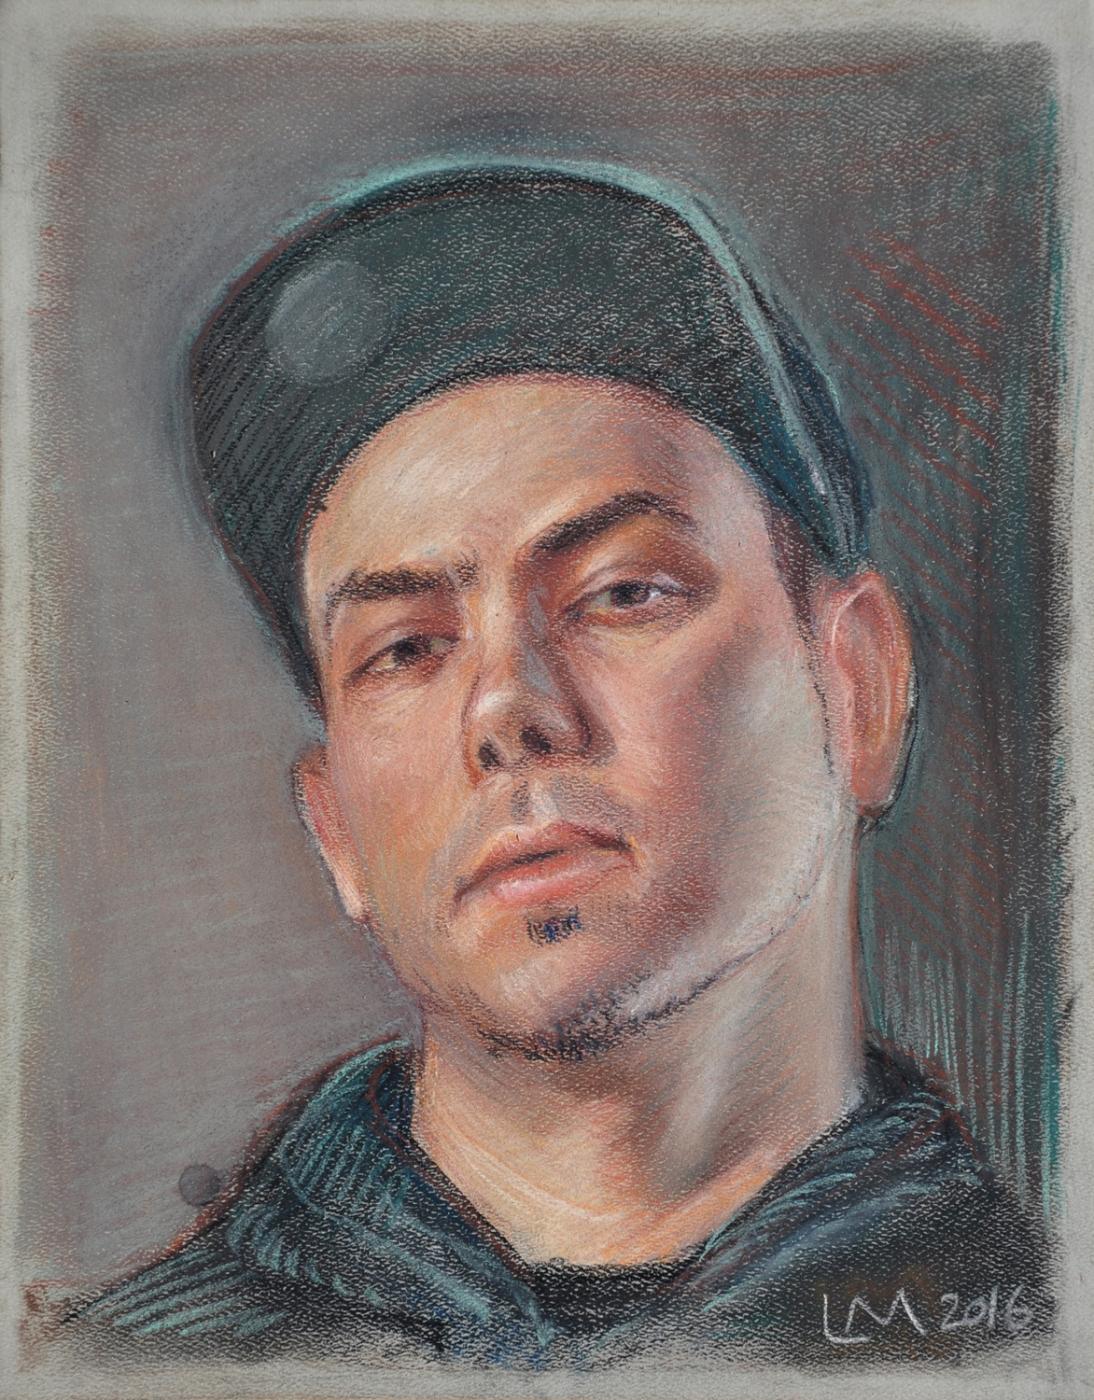 B-Boy Drew , chalk pastel, 2016